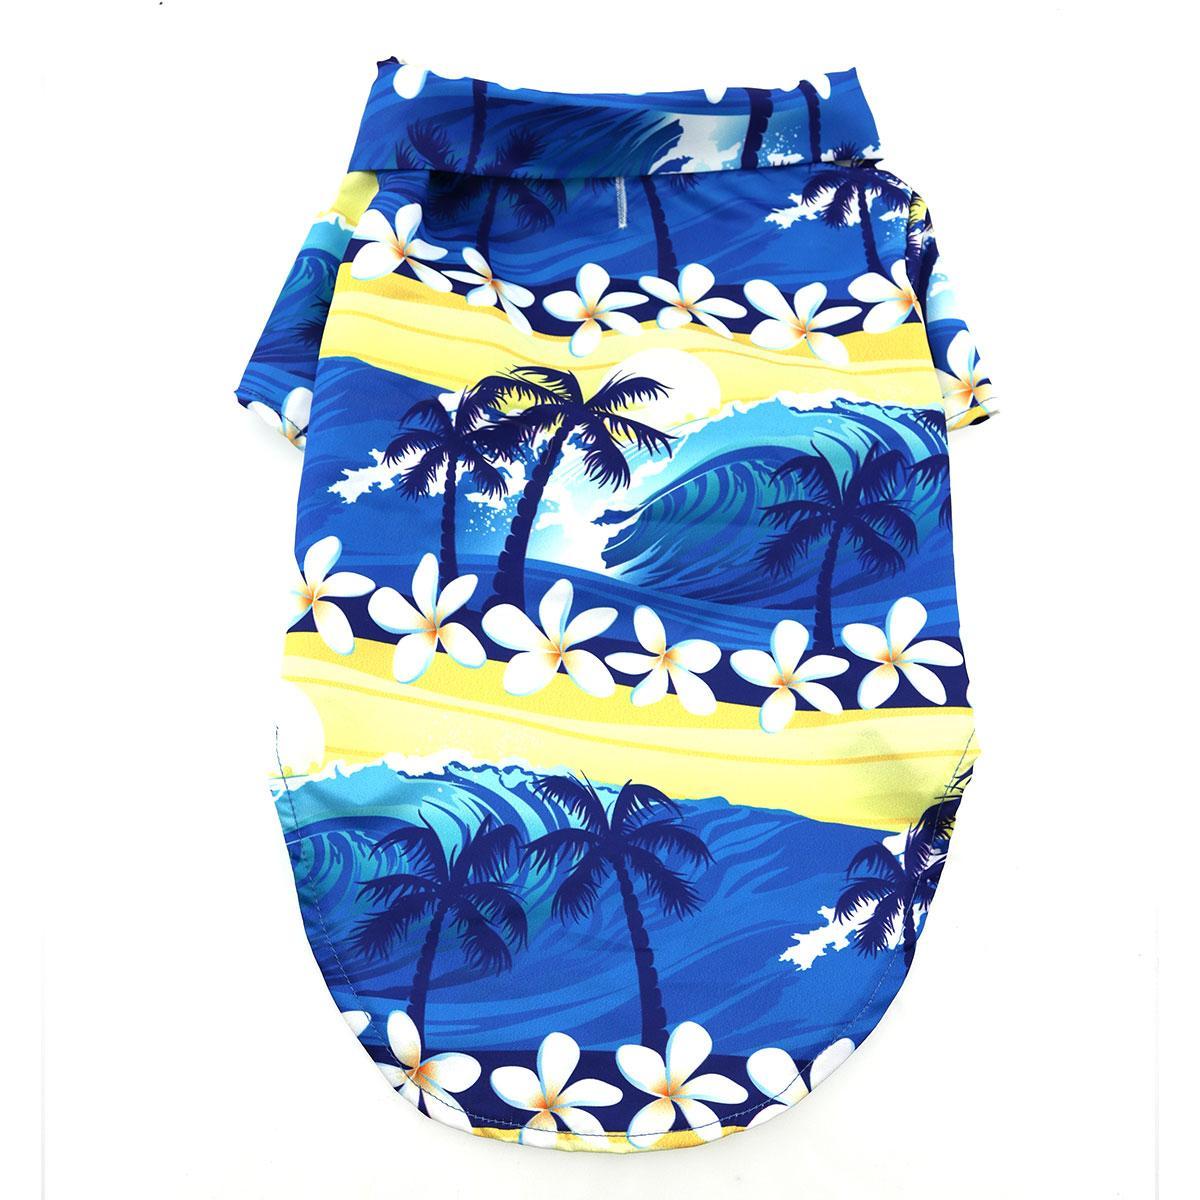 Hawaiian Camp Shirt by Doggie Design - Catching Waves